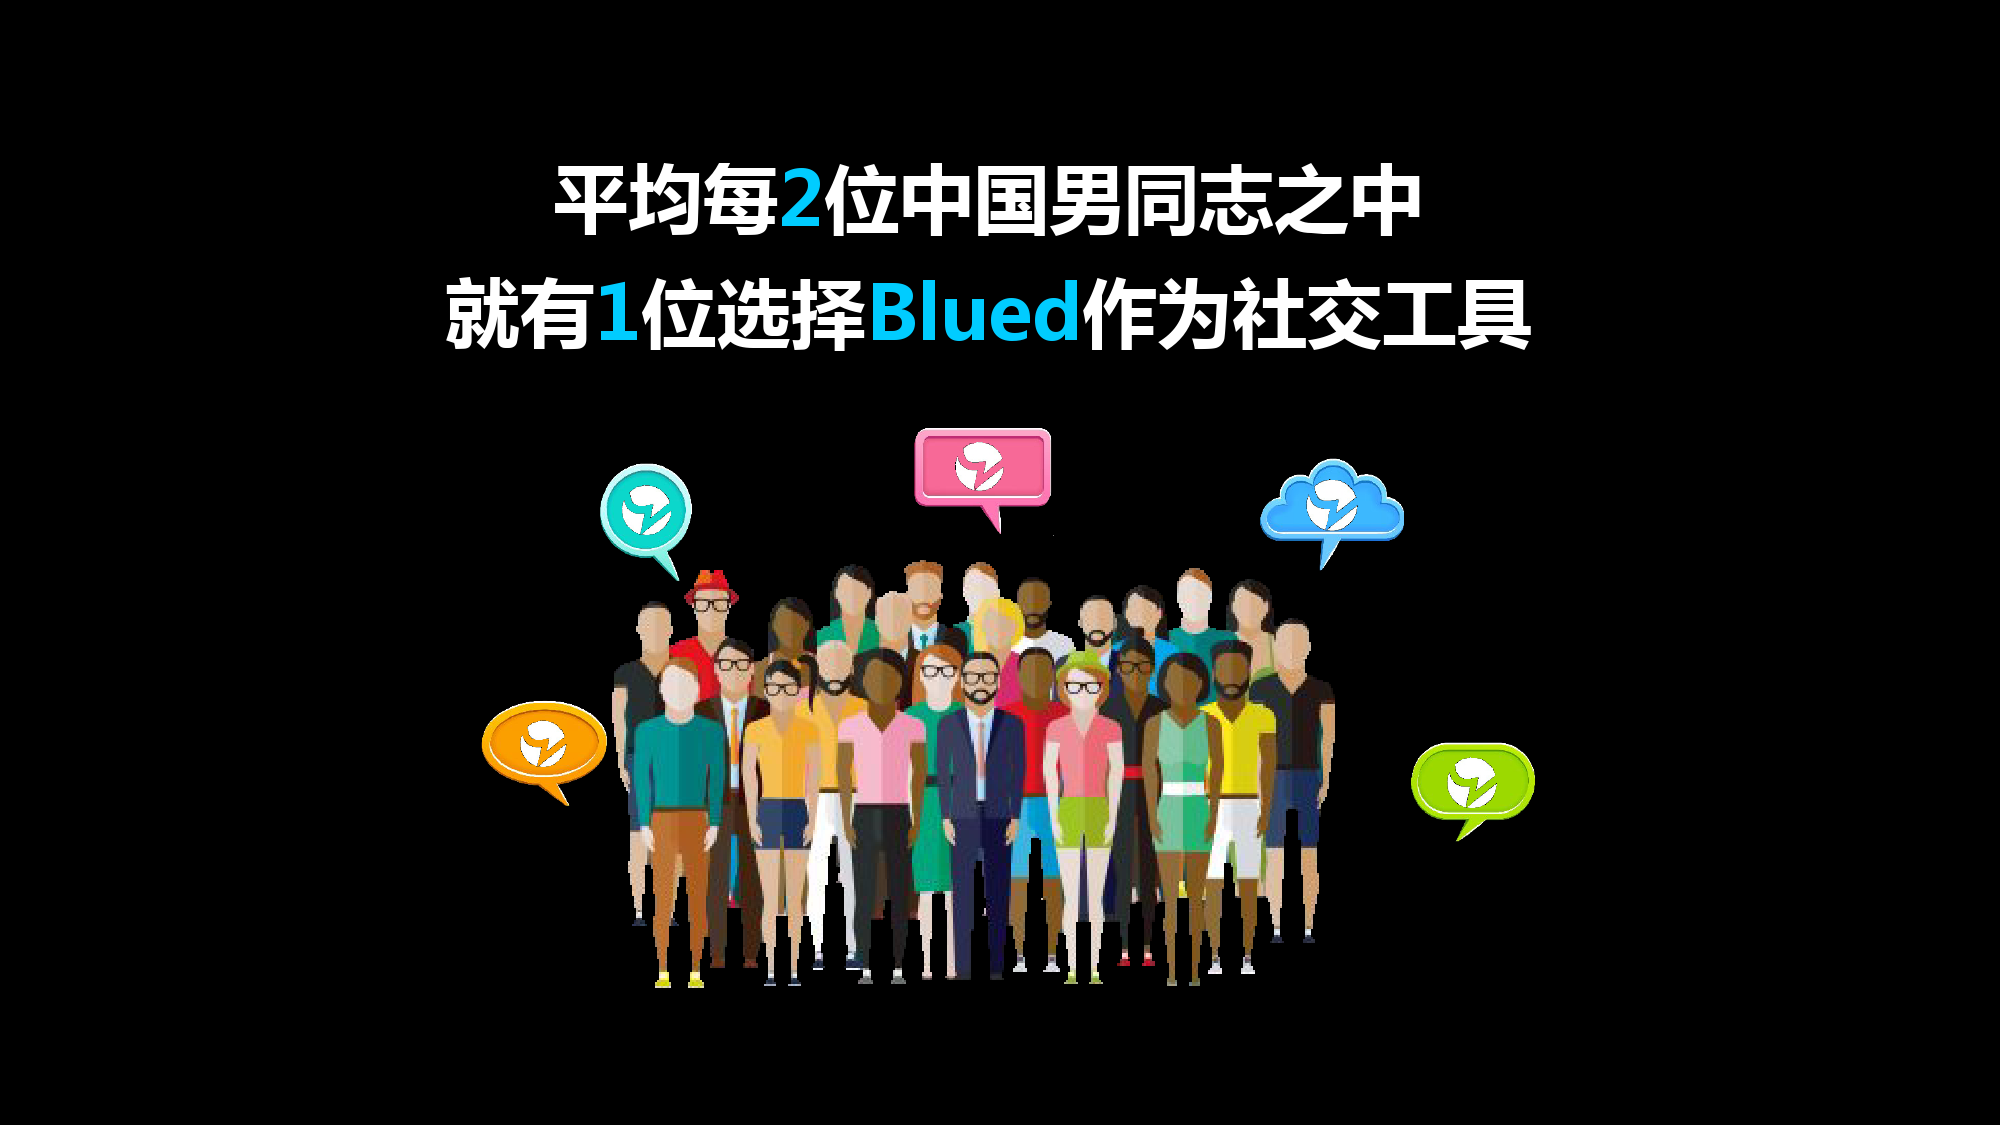 Blued2015中国同志社群大数据白皮书_000004